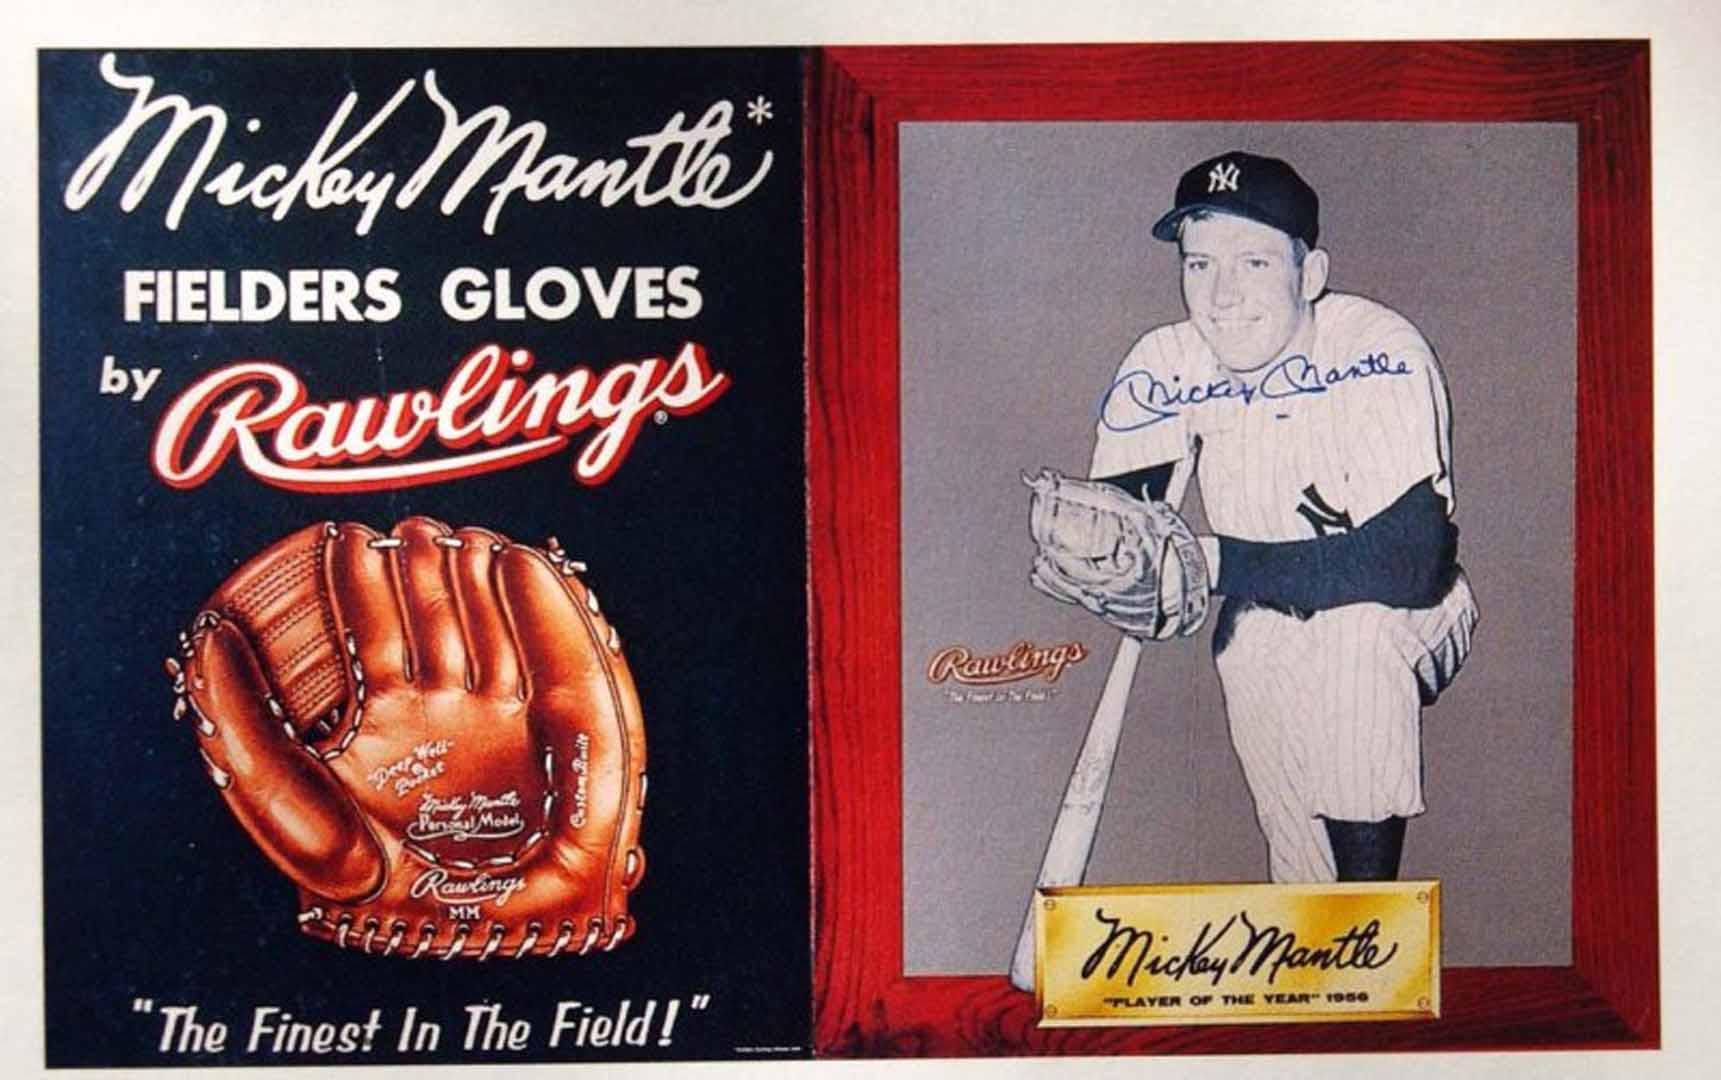 1957 18x31 hard cardboard poster